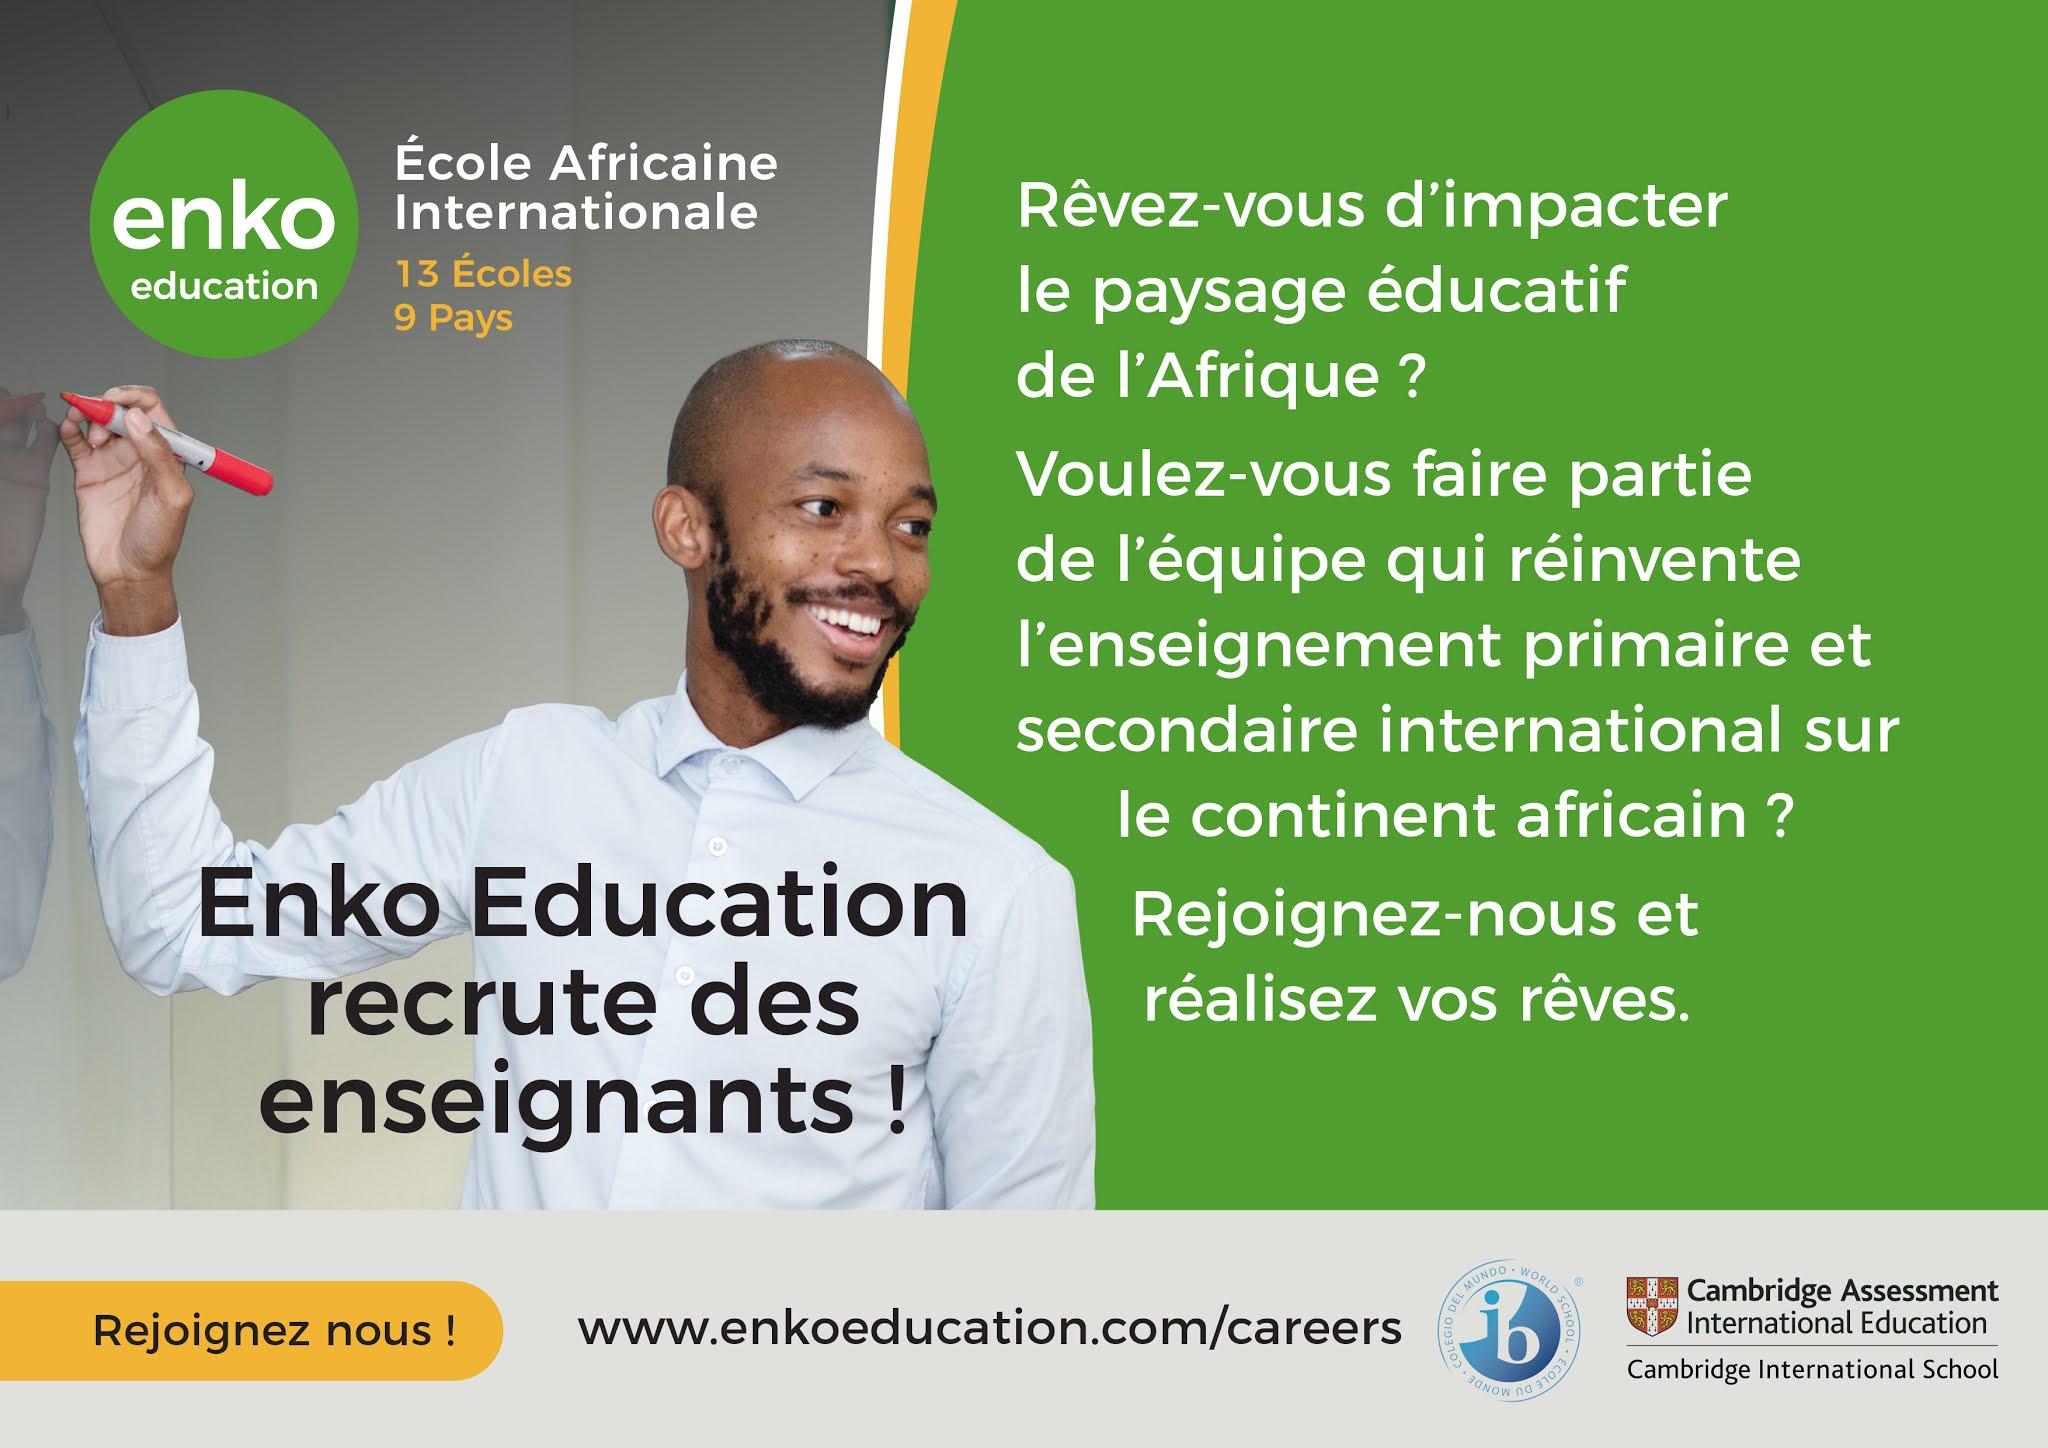 Enko Education is recruiting 60 teachers